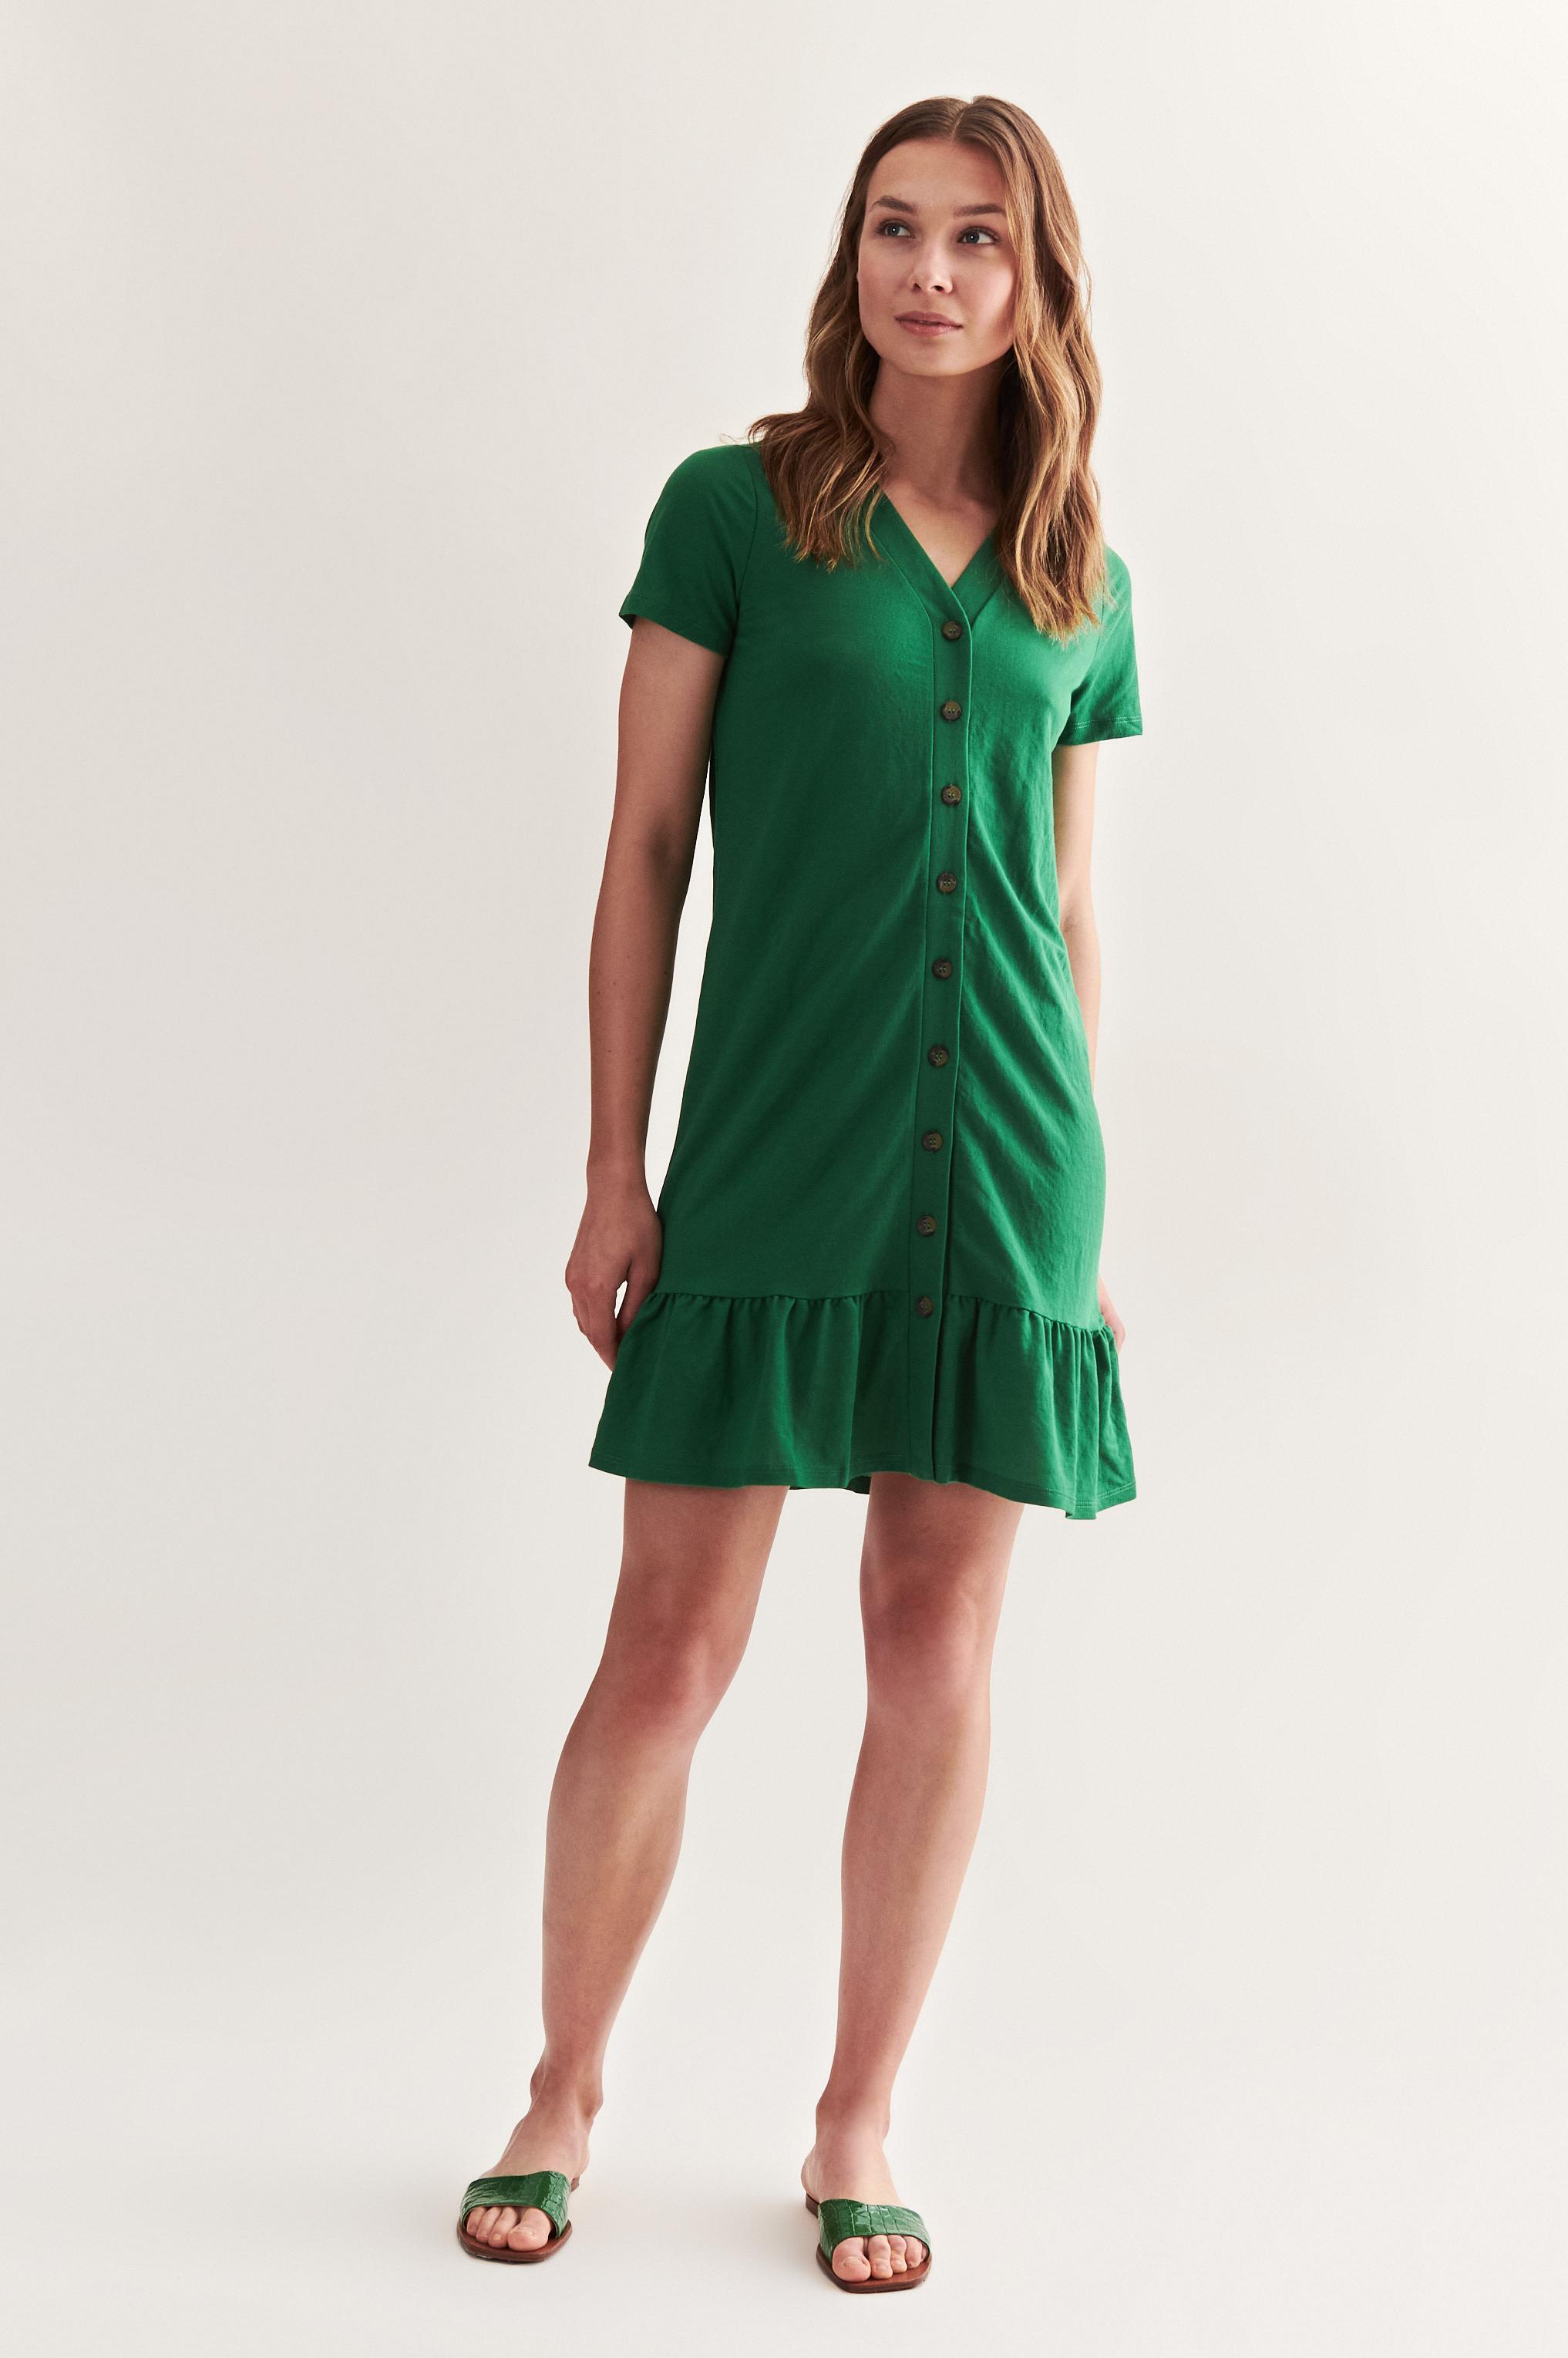 GREEN DRESS WITH FRILL APIANA